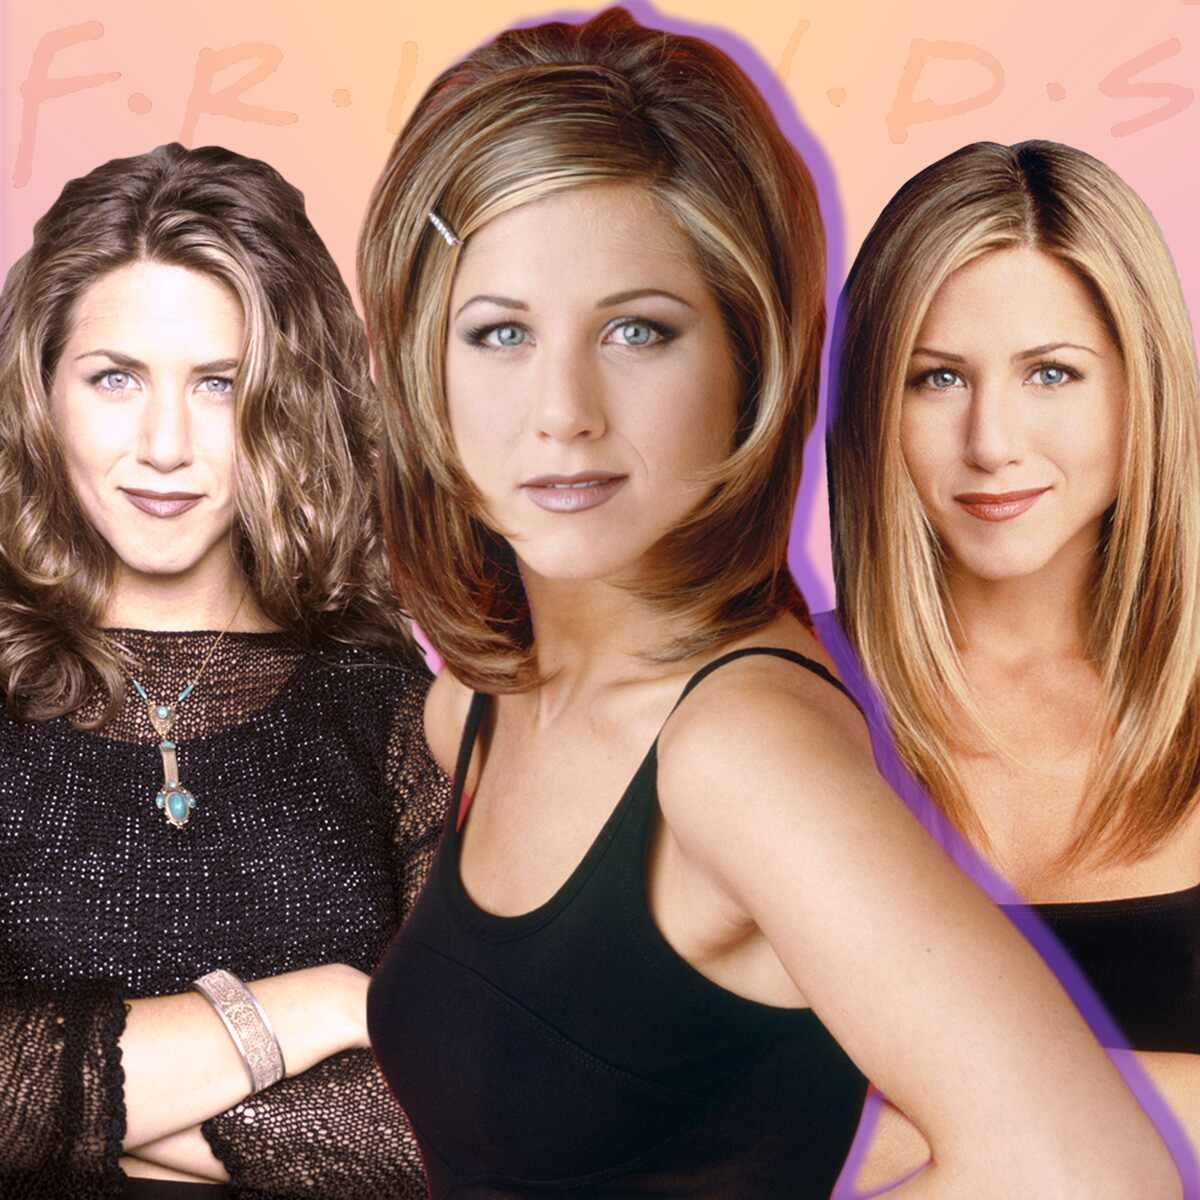 Jennifer Aniston, Rachel Hair Gallery, Friends